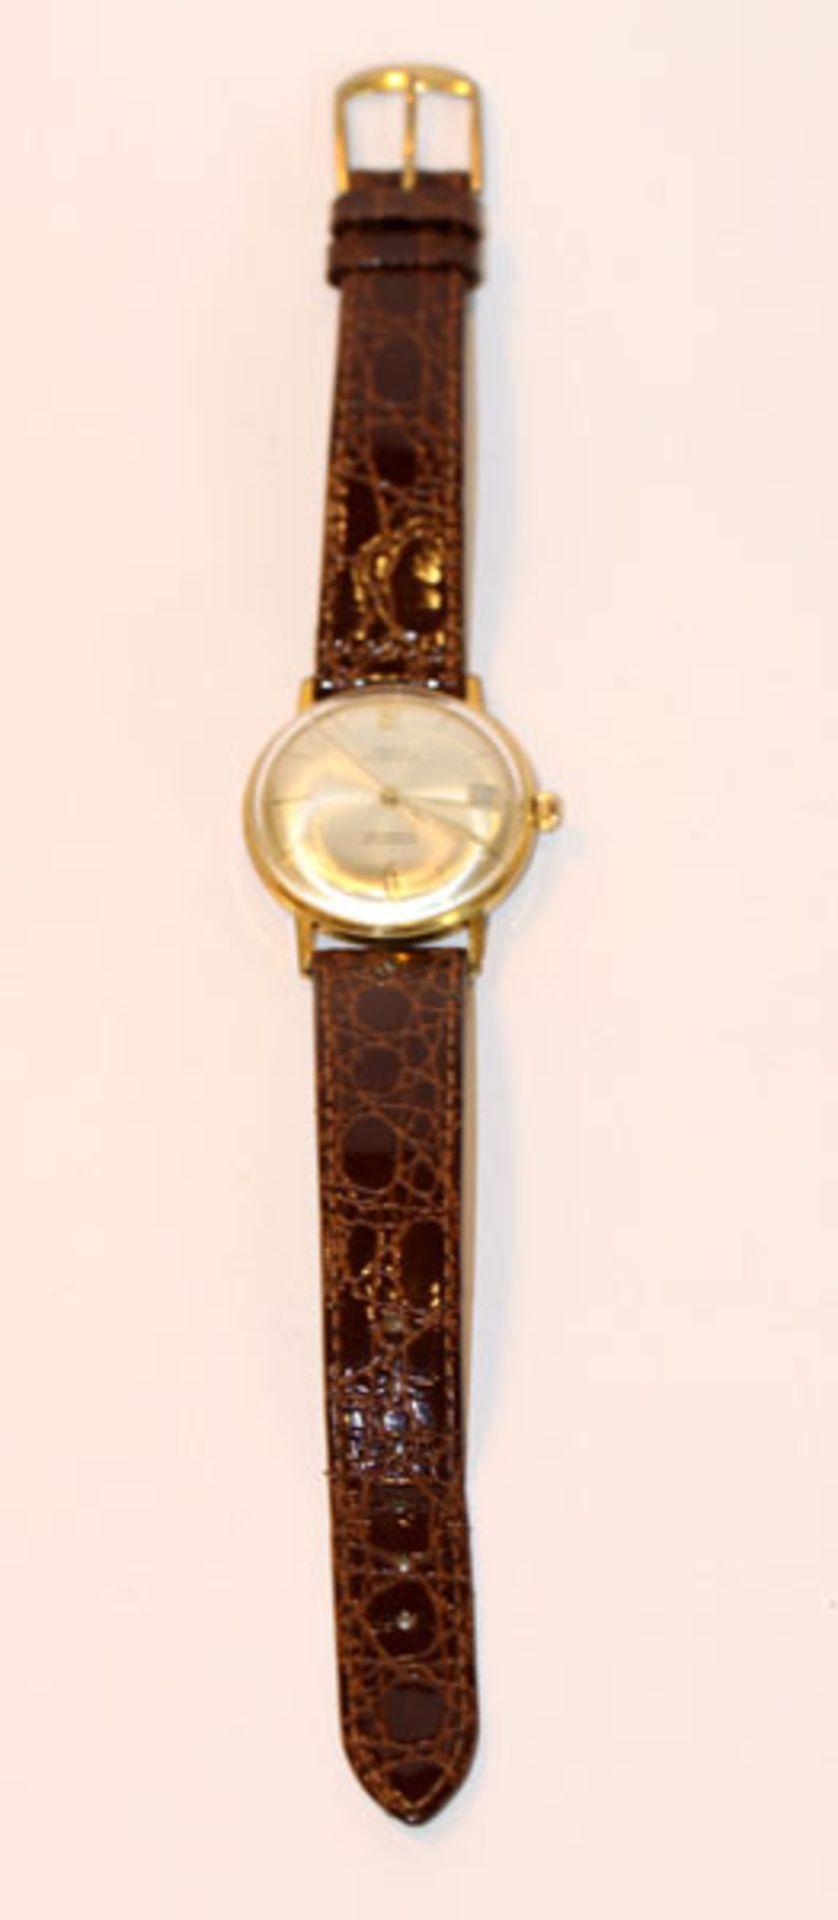 Los 16 - Osco Automatic Armbanduhr um 1960/65, Datumsanzeige, intakt, an braunem Armband, Tragespuren